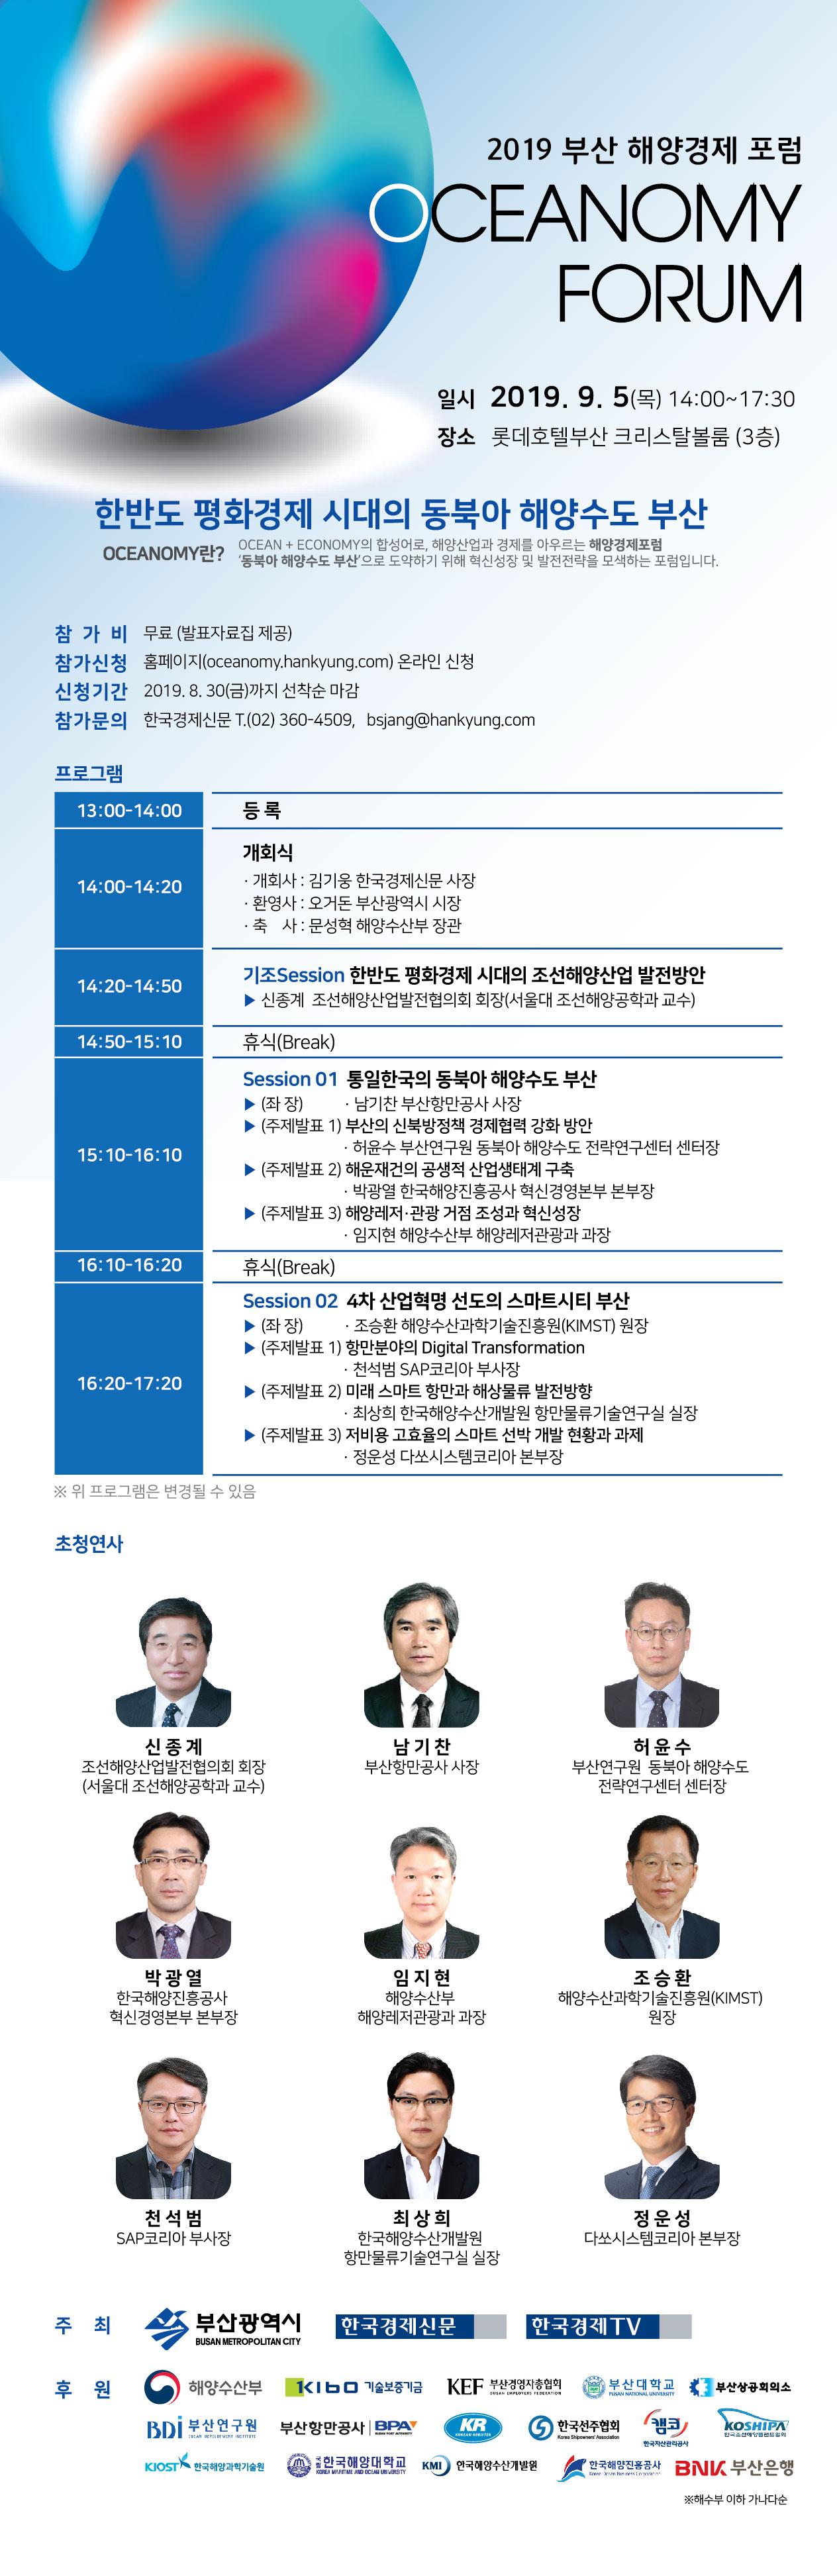 Oceanomy Forum 2019